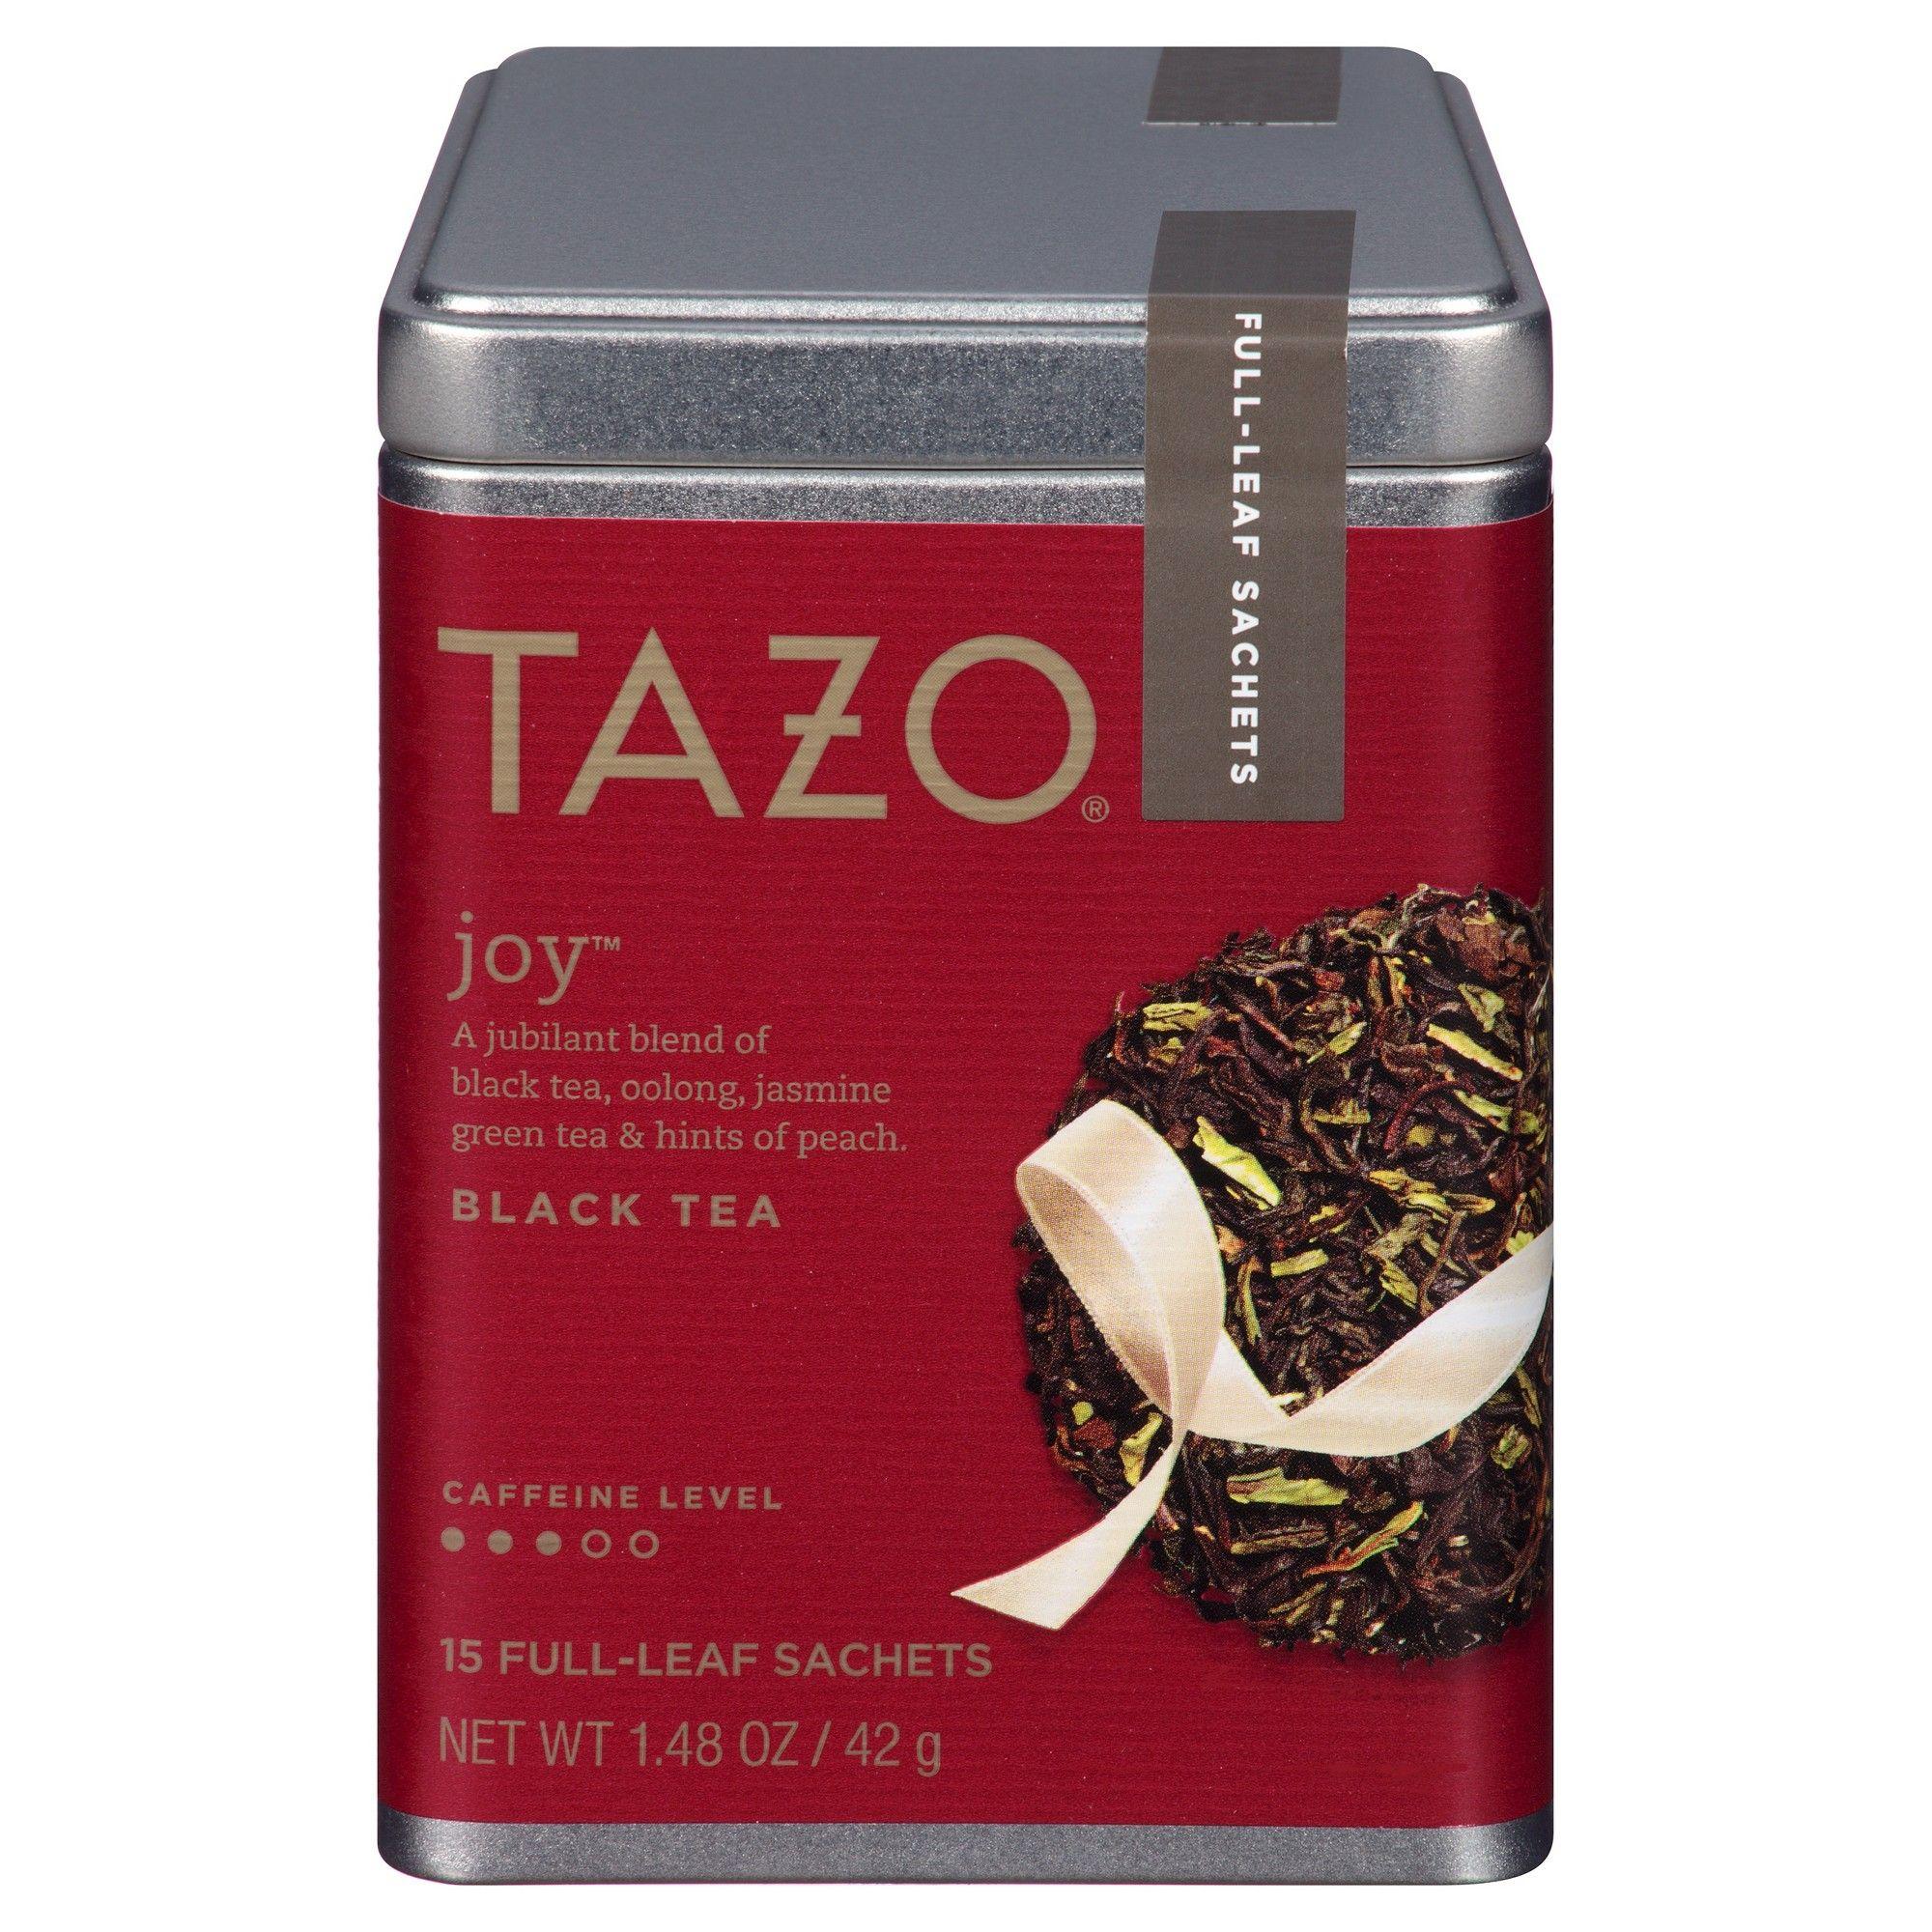 Tazo Joy Black Tea Sachets 15 ct Tazo, Tea, Jasmine